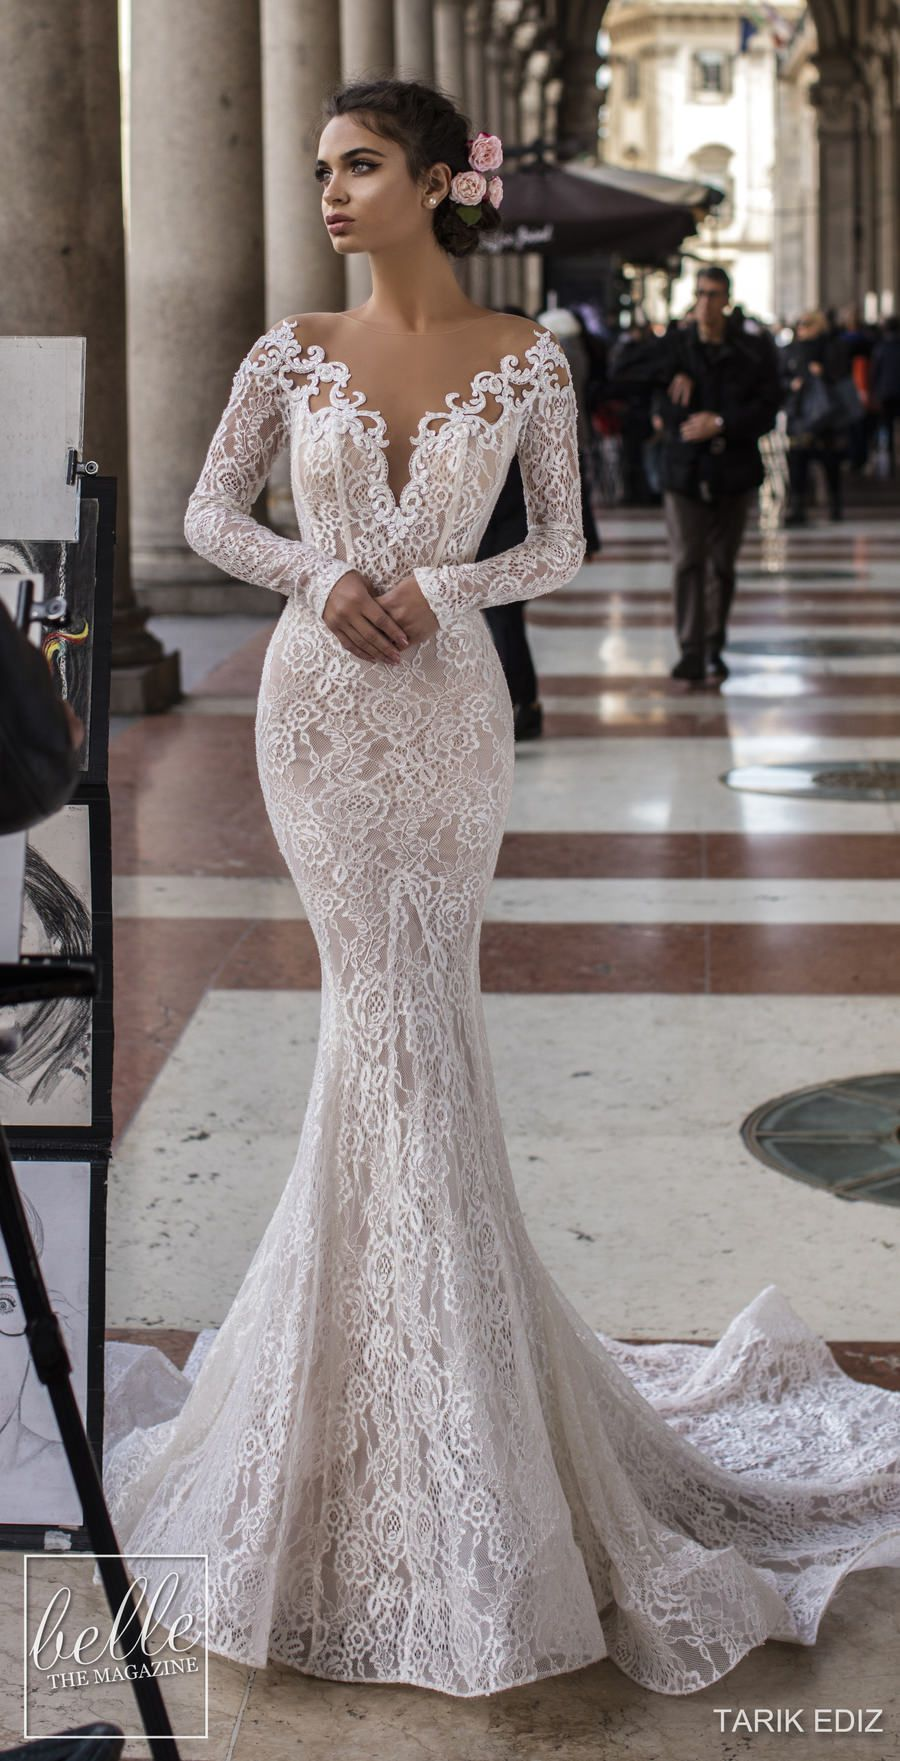 Tarik Ediz Wedding Dresses 2019 Belle The Magazine Lace Mermaid Wedding Dress Wedding Dress Long Sleeve Wedding Dresses [ 1761 x 900 Pixel ]